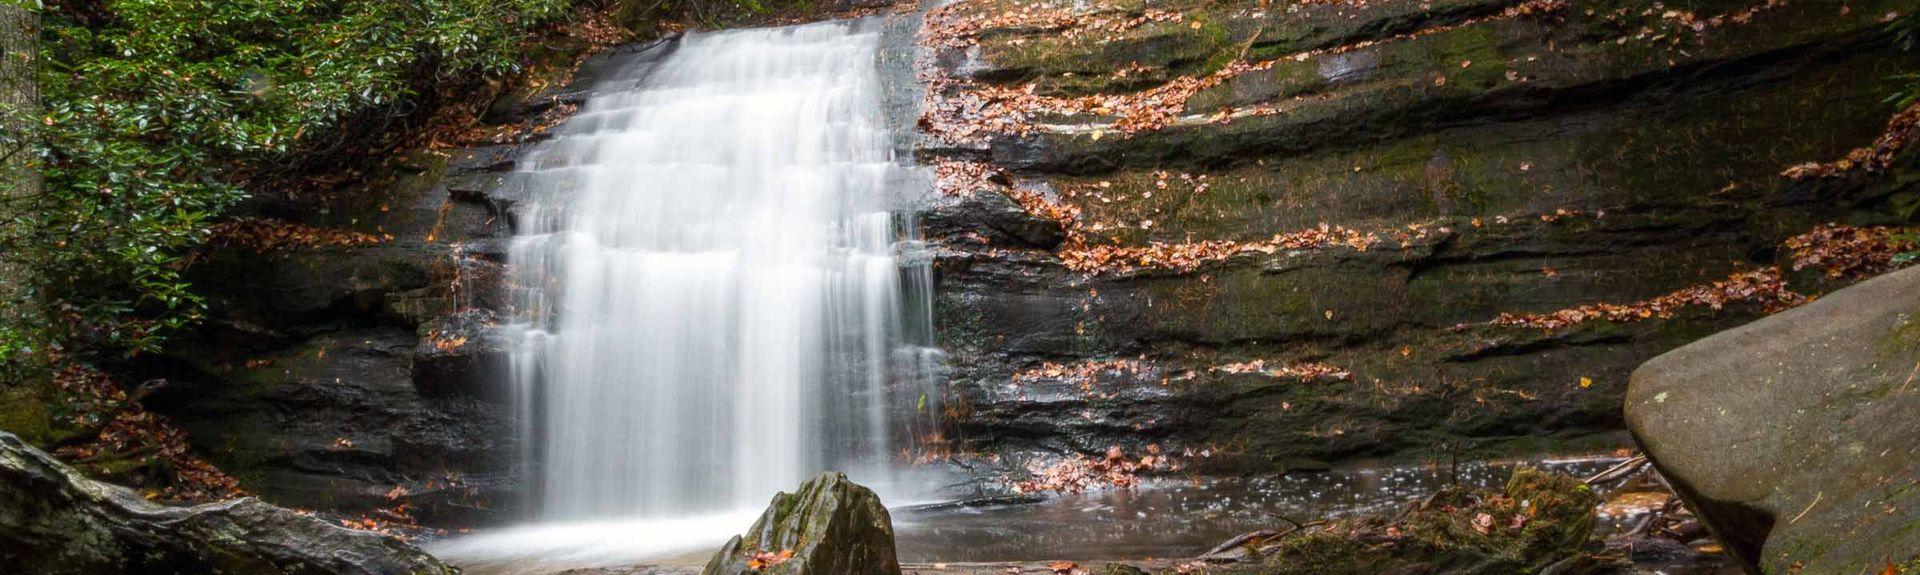 Copperhill, Tennessee, Estados Unidos